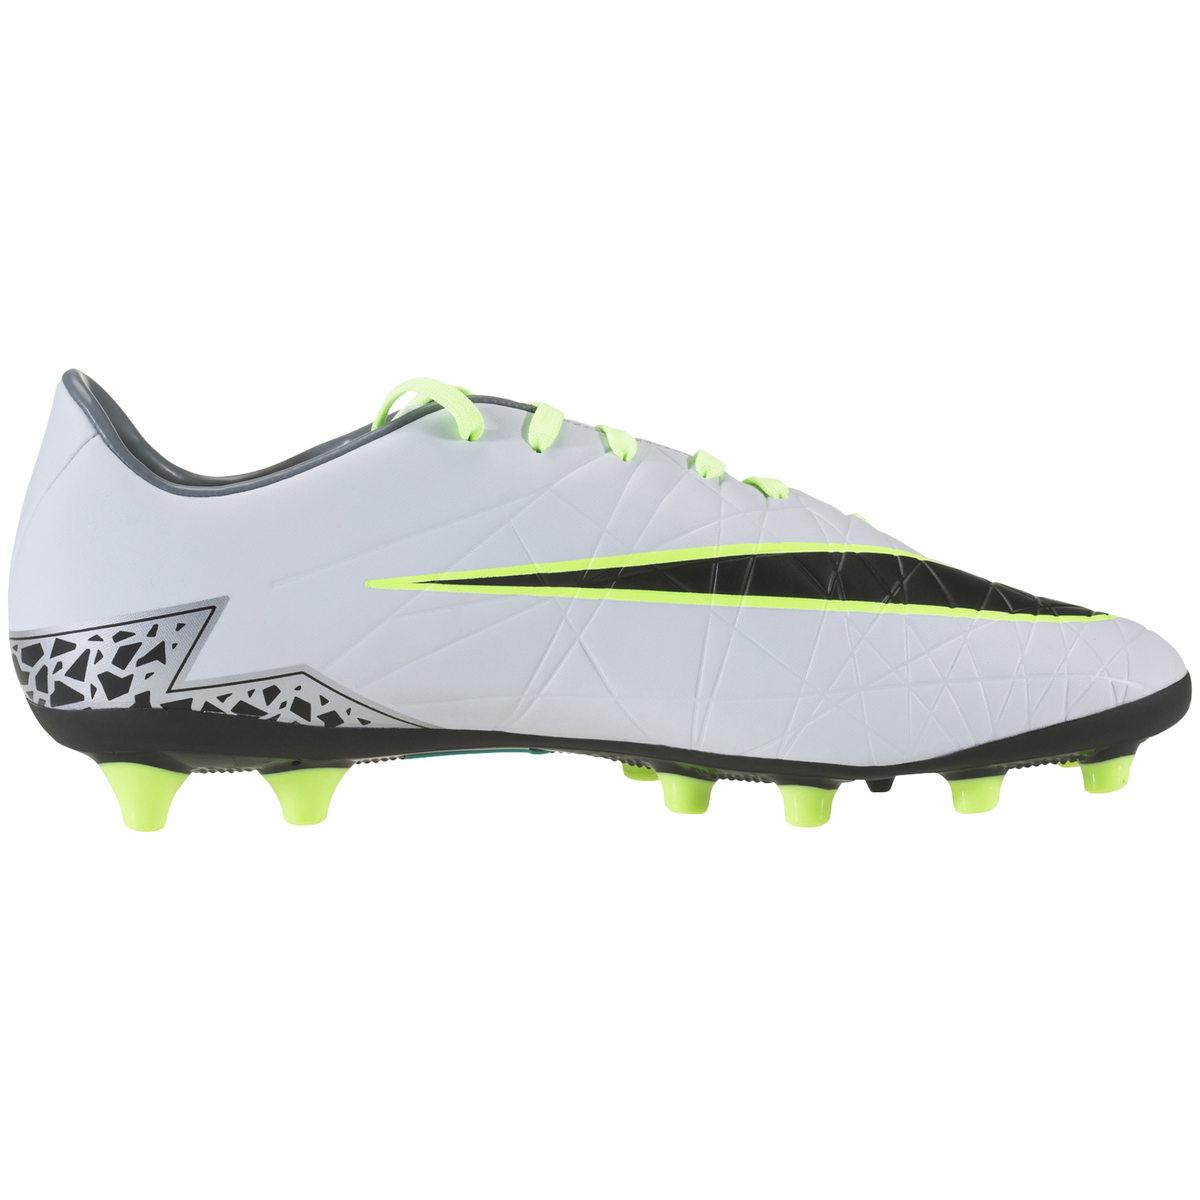 lowest price c0299 c8a5b nike hypervenom phelon ii ag q3 16 fotbollssko senior fotbollsskor